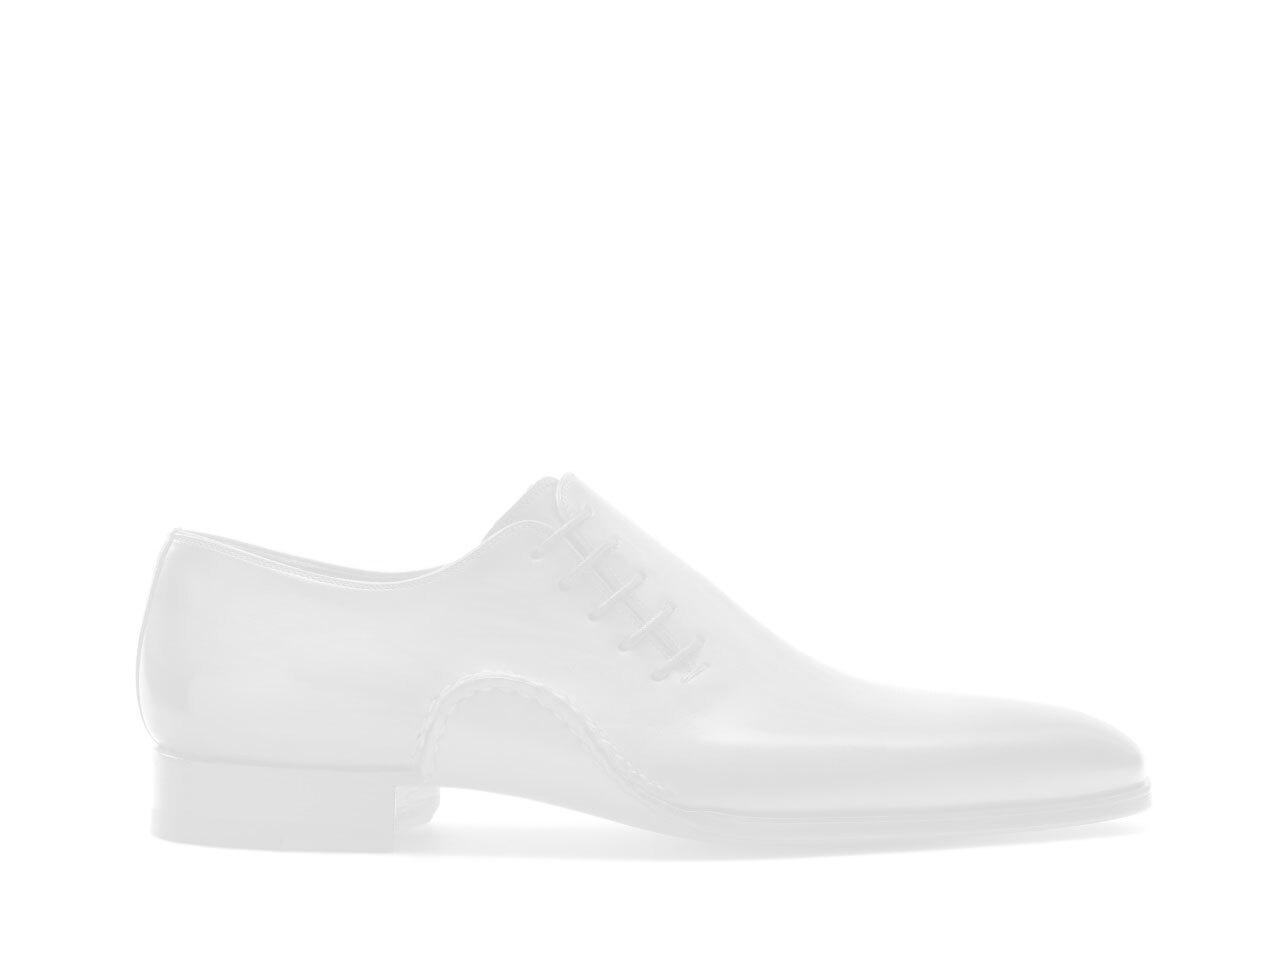 Pair of the Magnanni Huston Lo Cognac Men's Sneakers